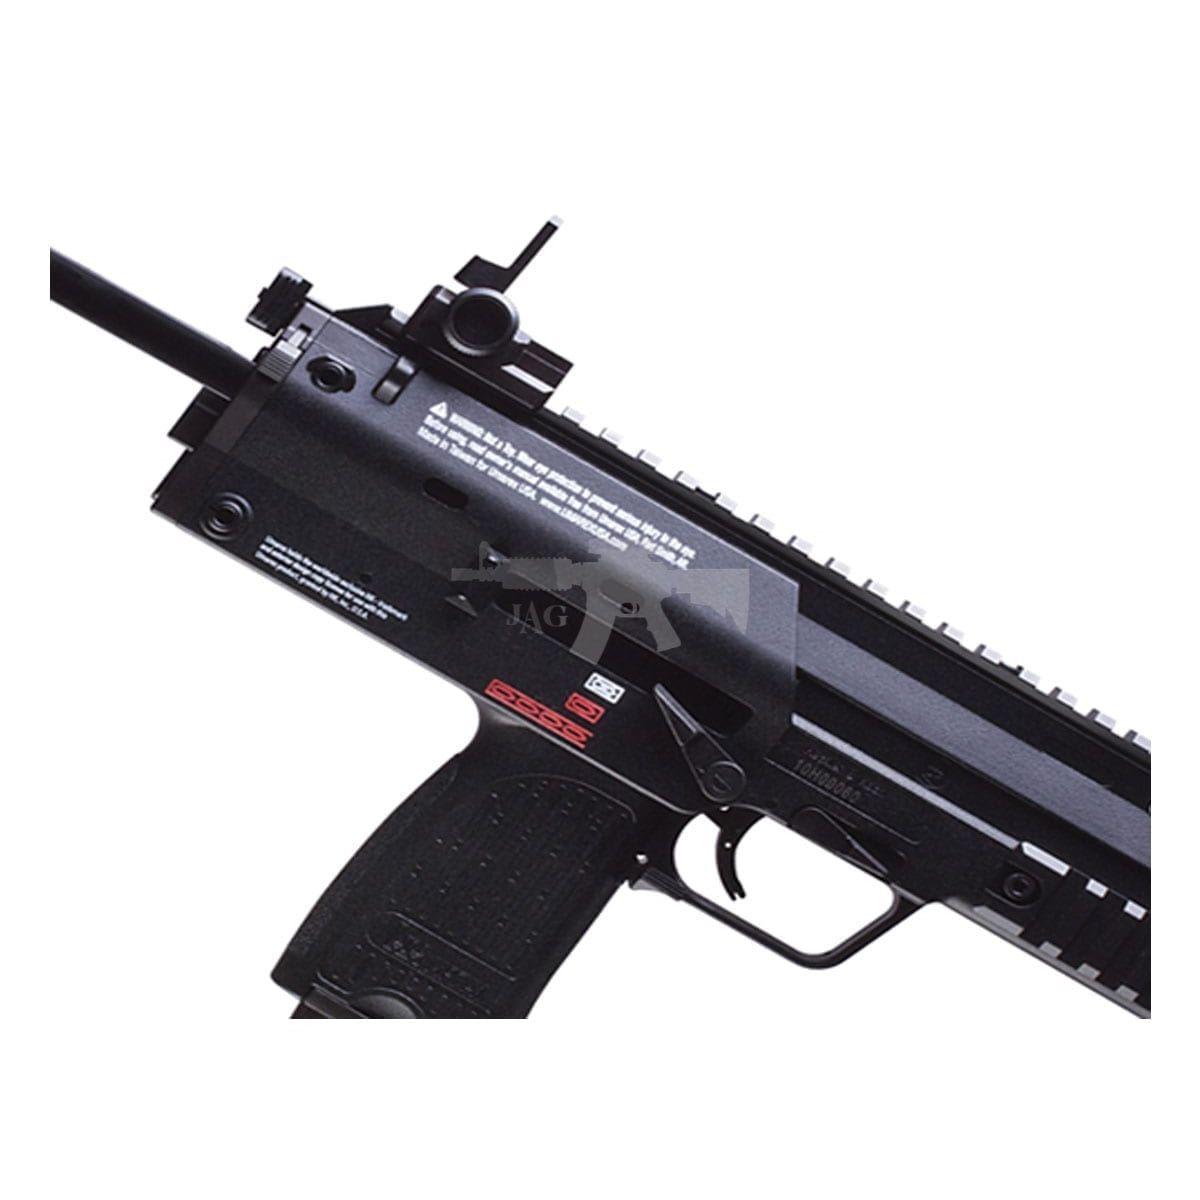 HK MP7 FULL AUTO AIRSOFT GAS RIFLE